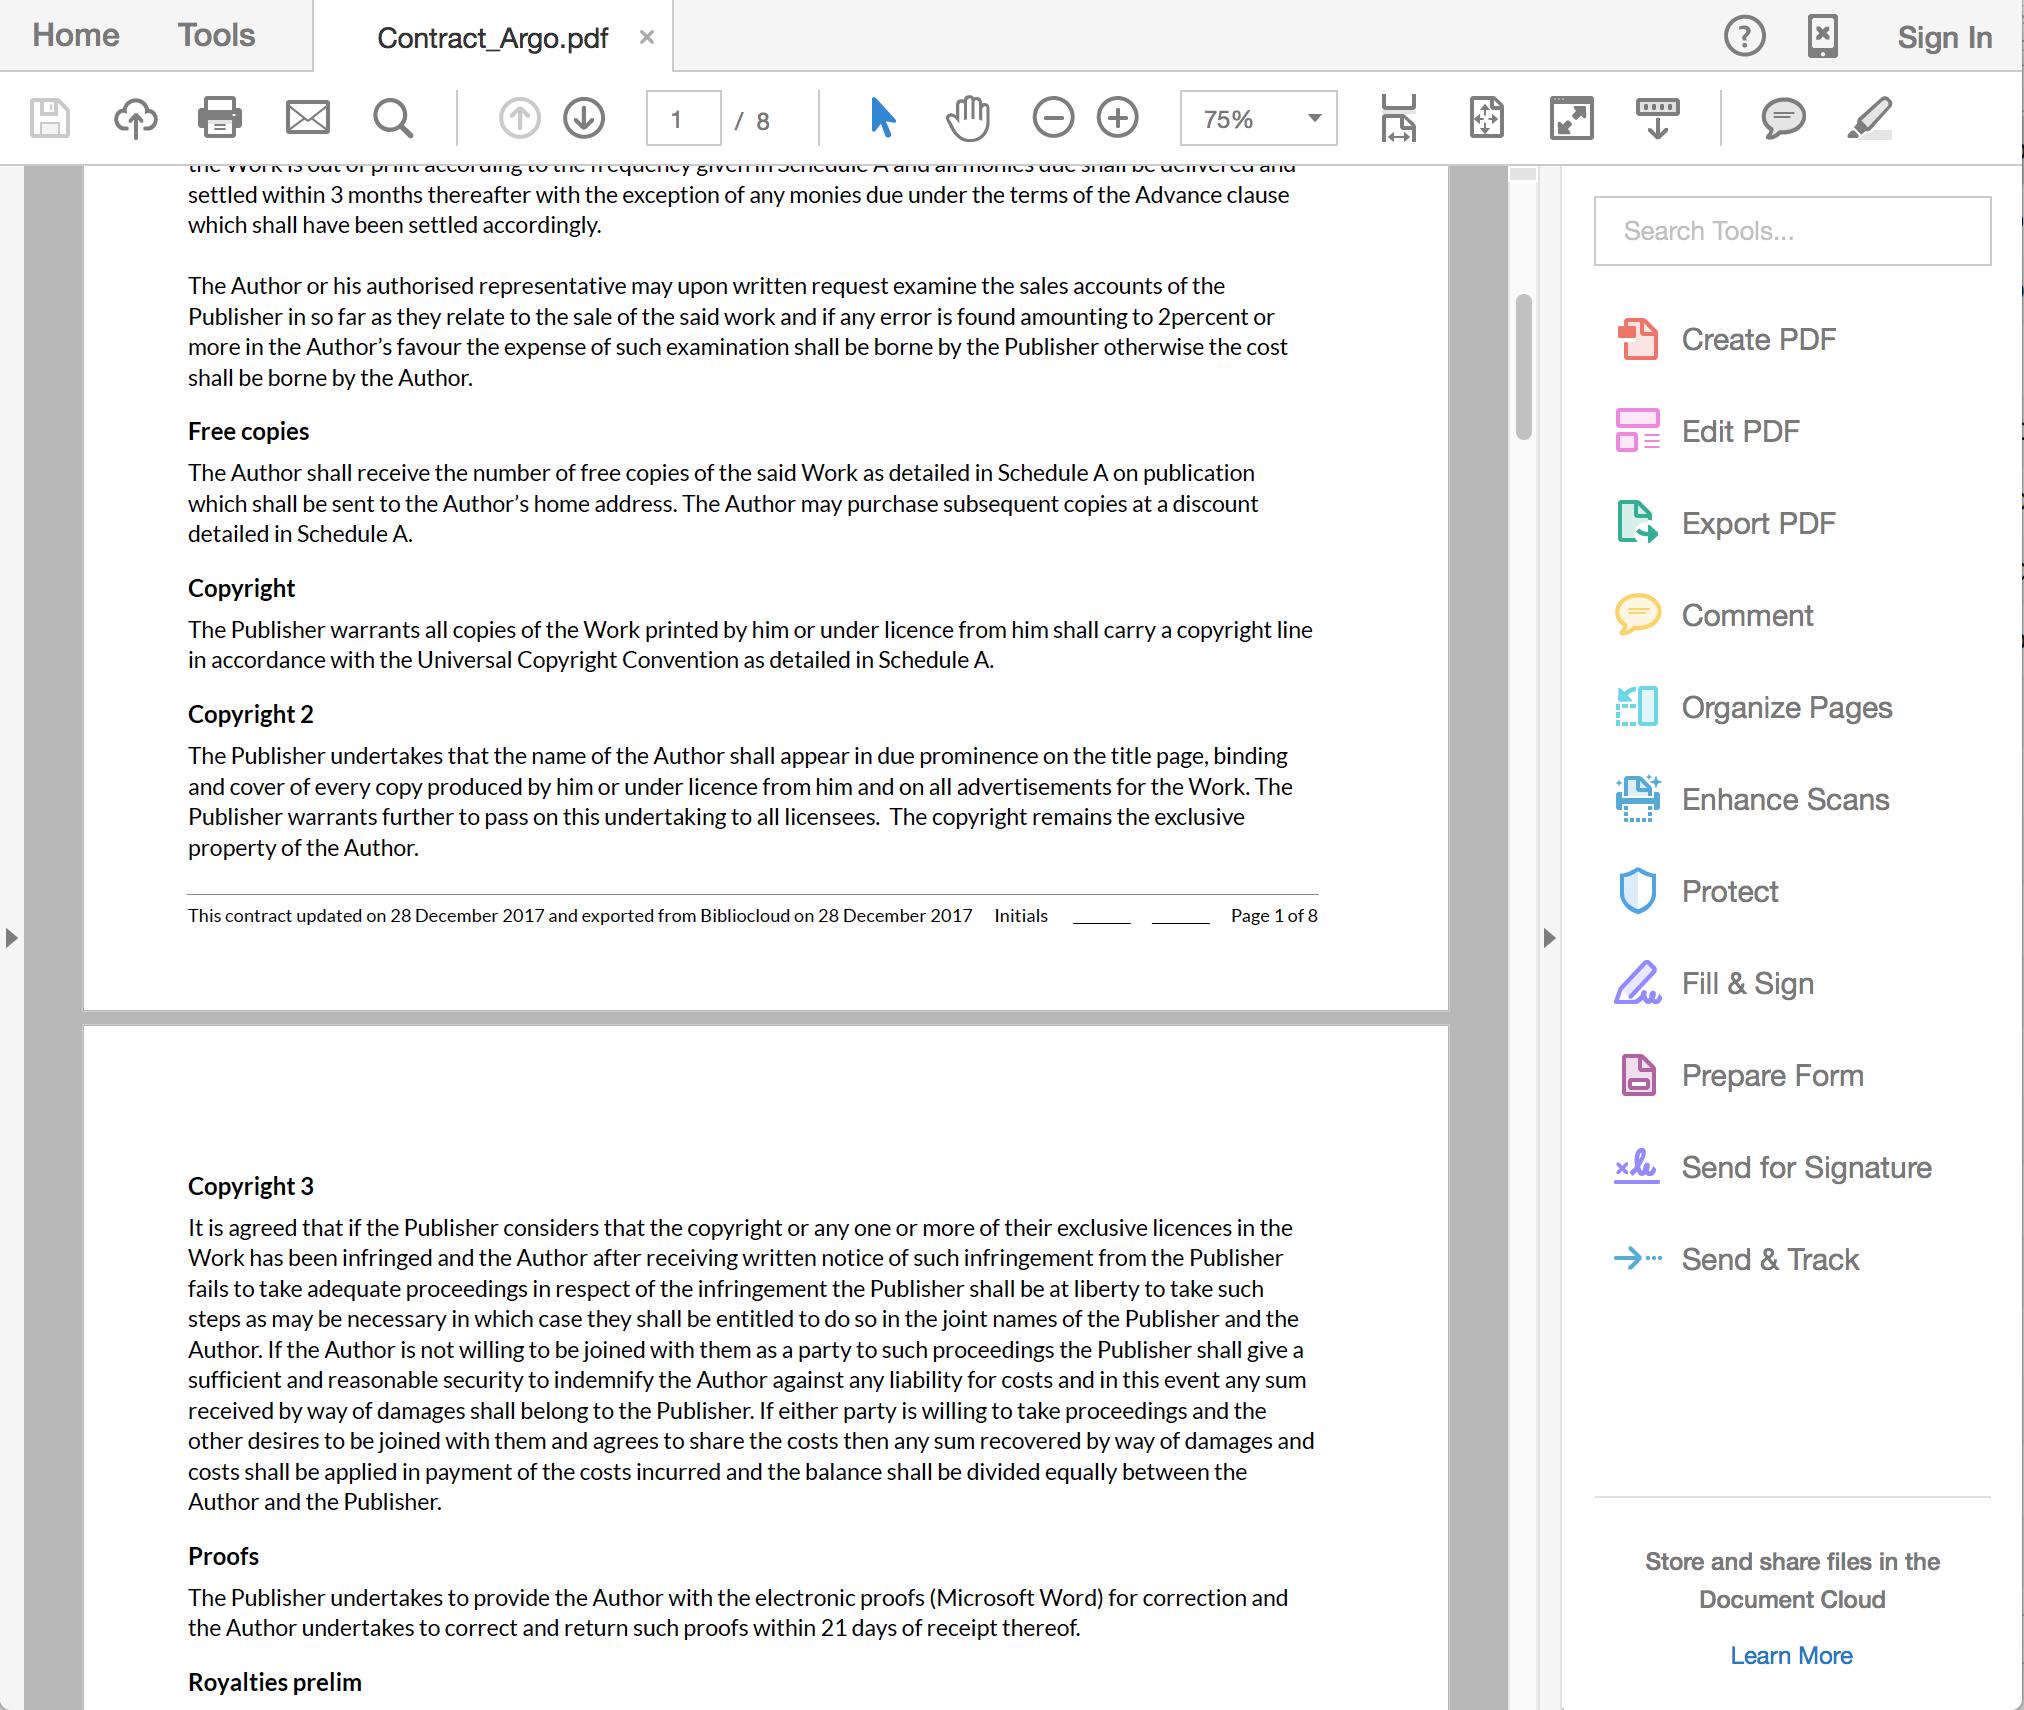 Contracts screenshot